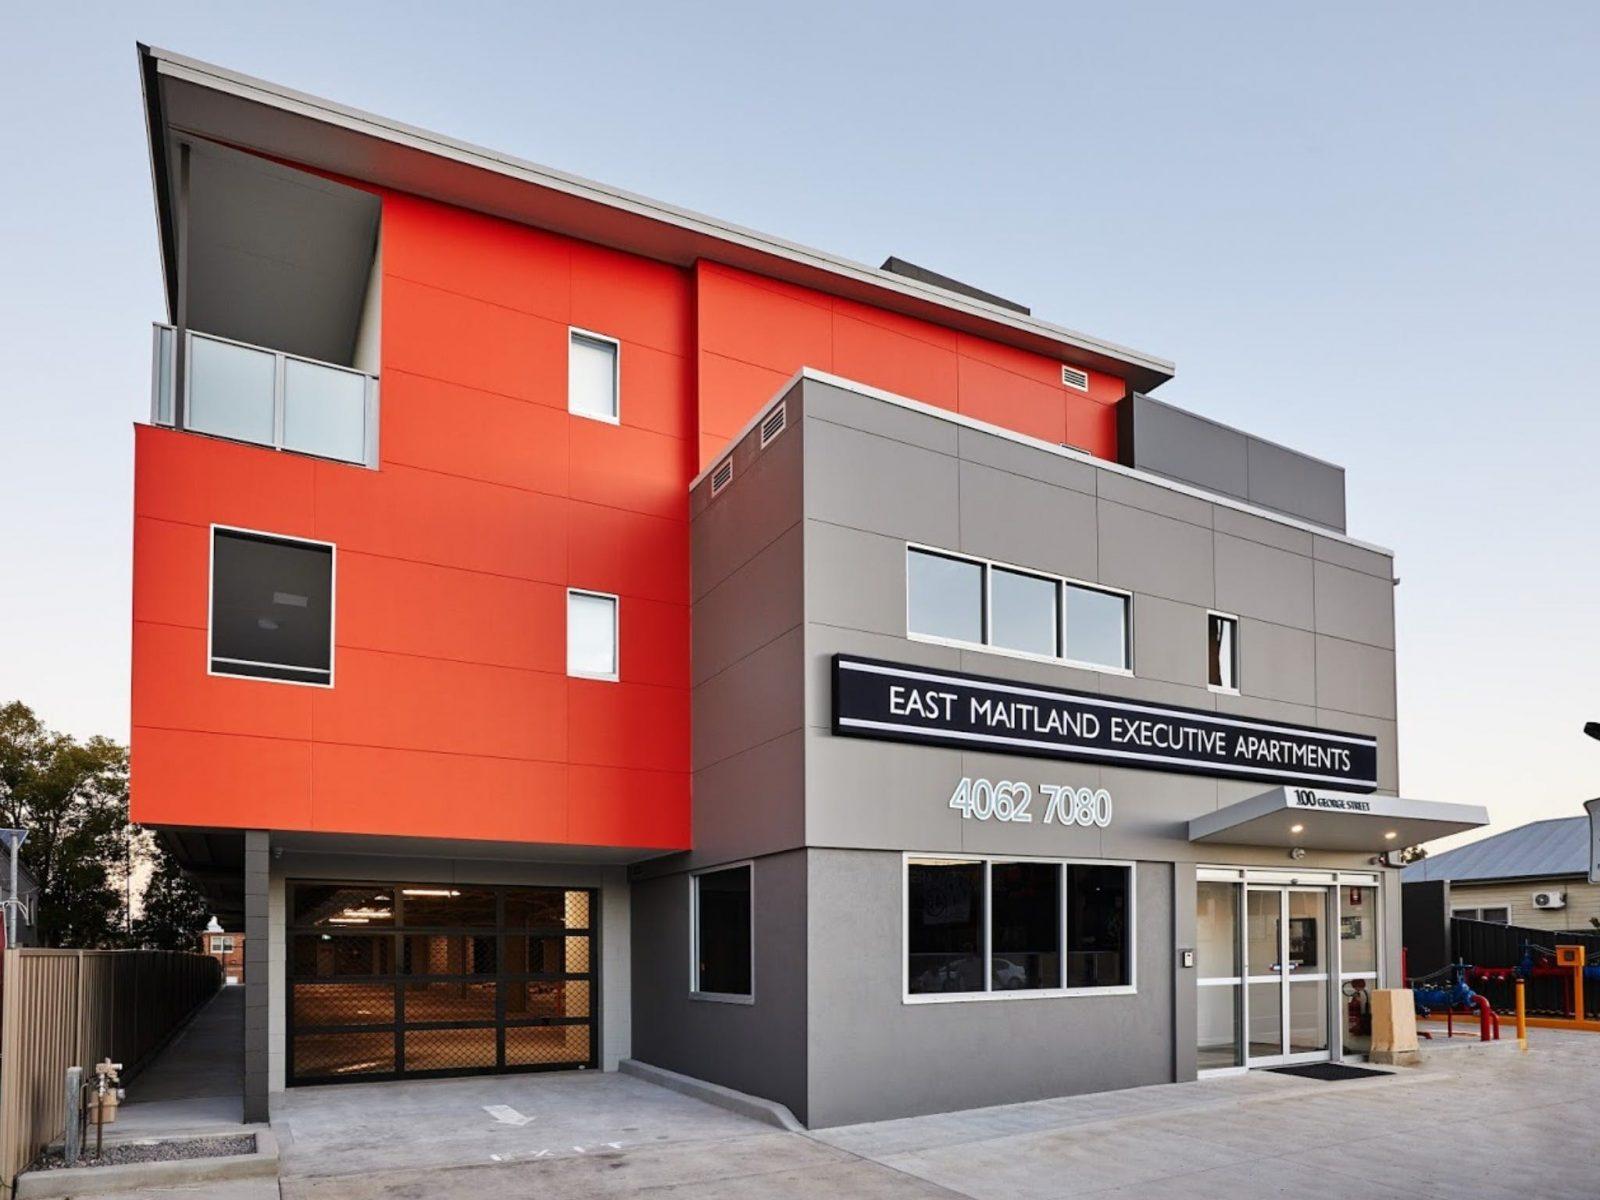 East Maitland Executive Apartments - Outdoor